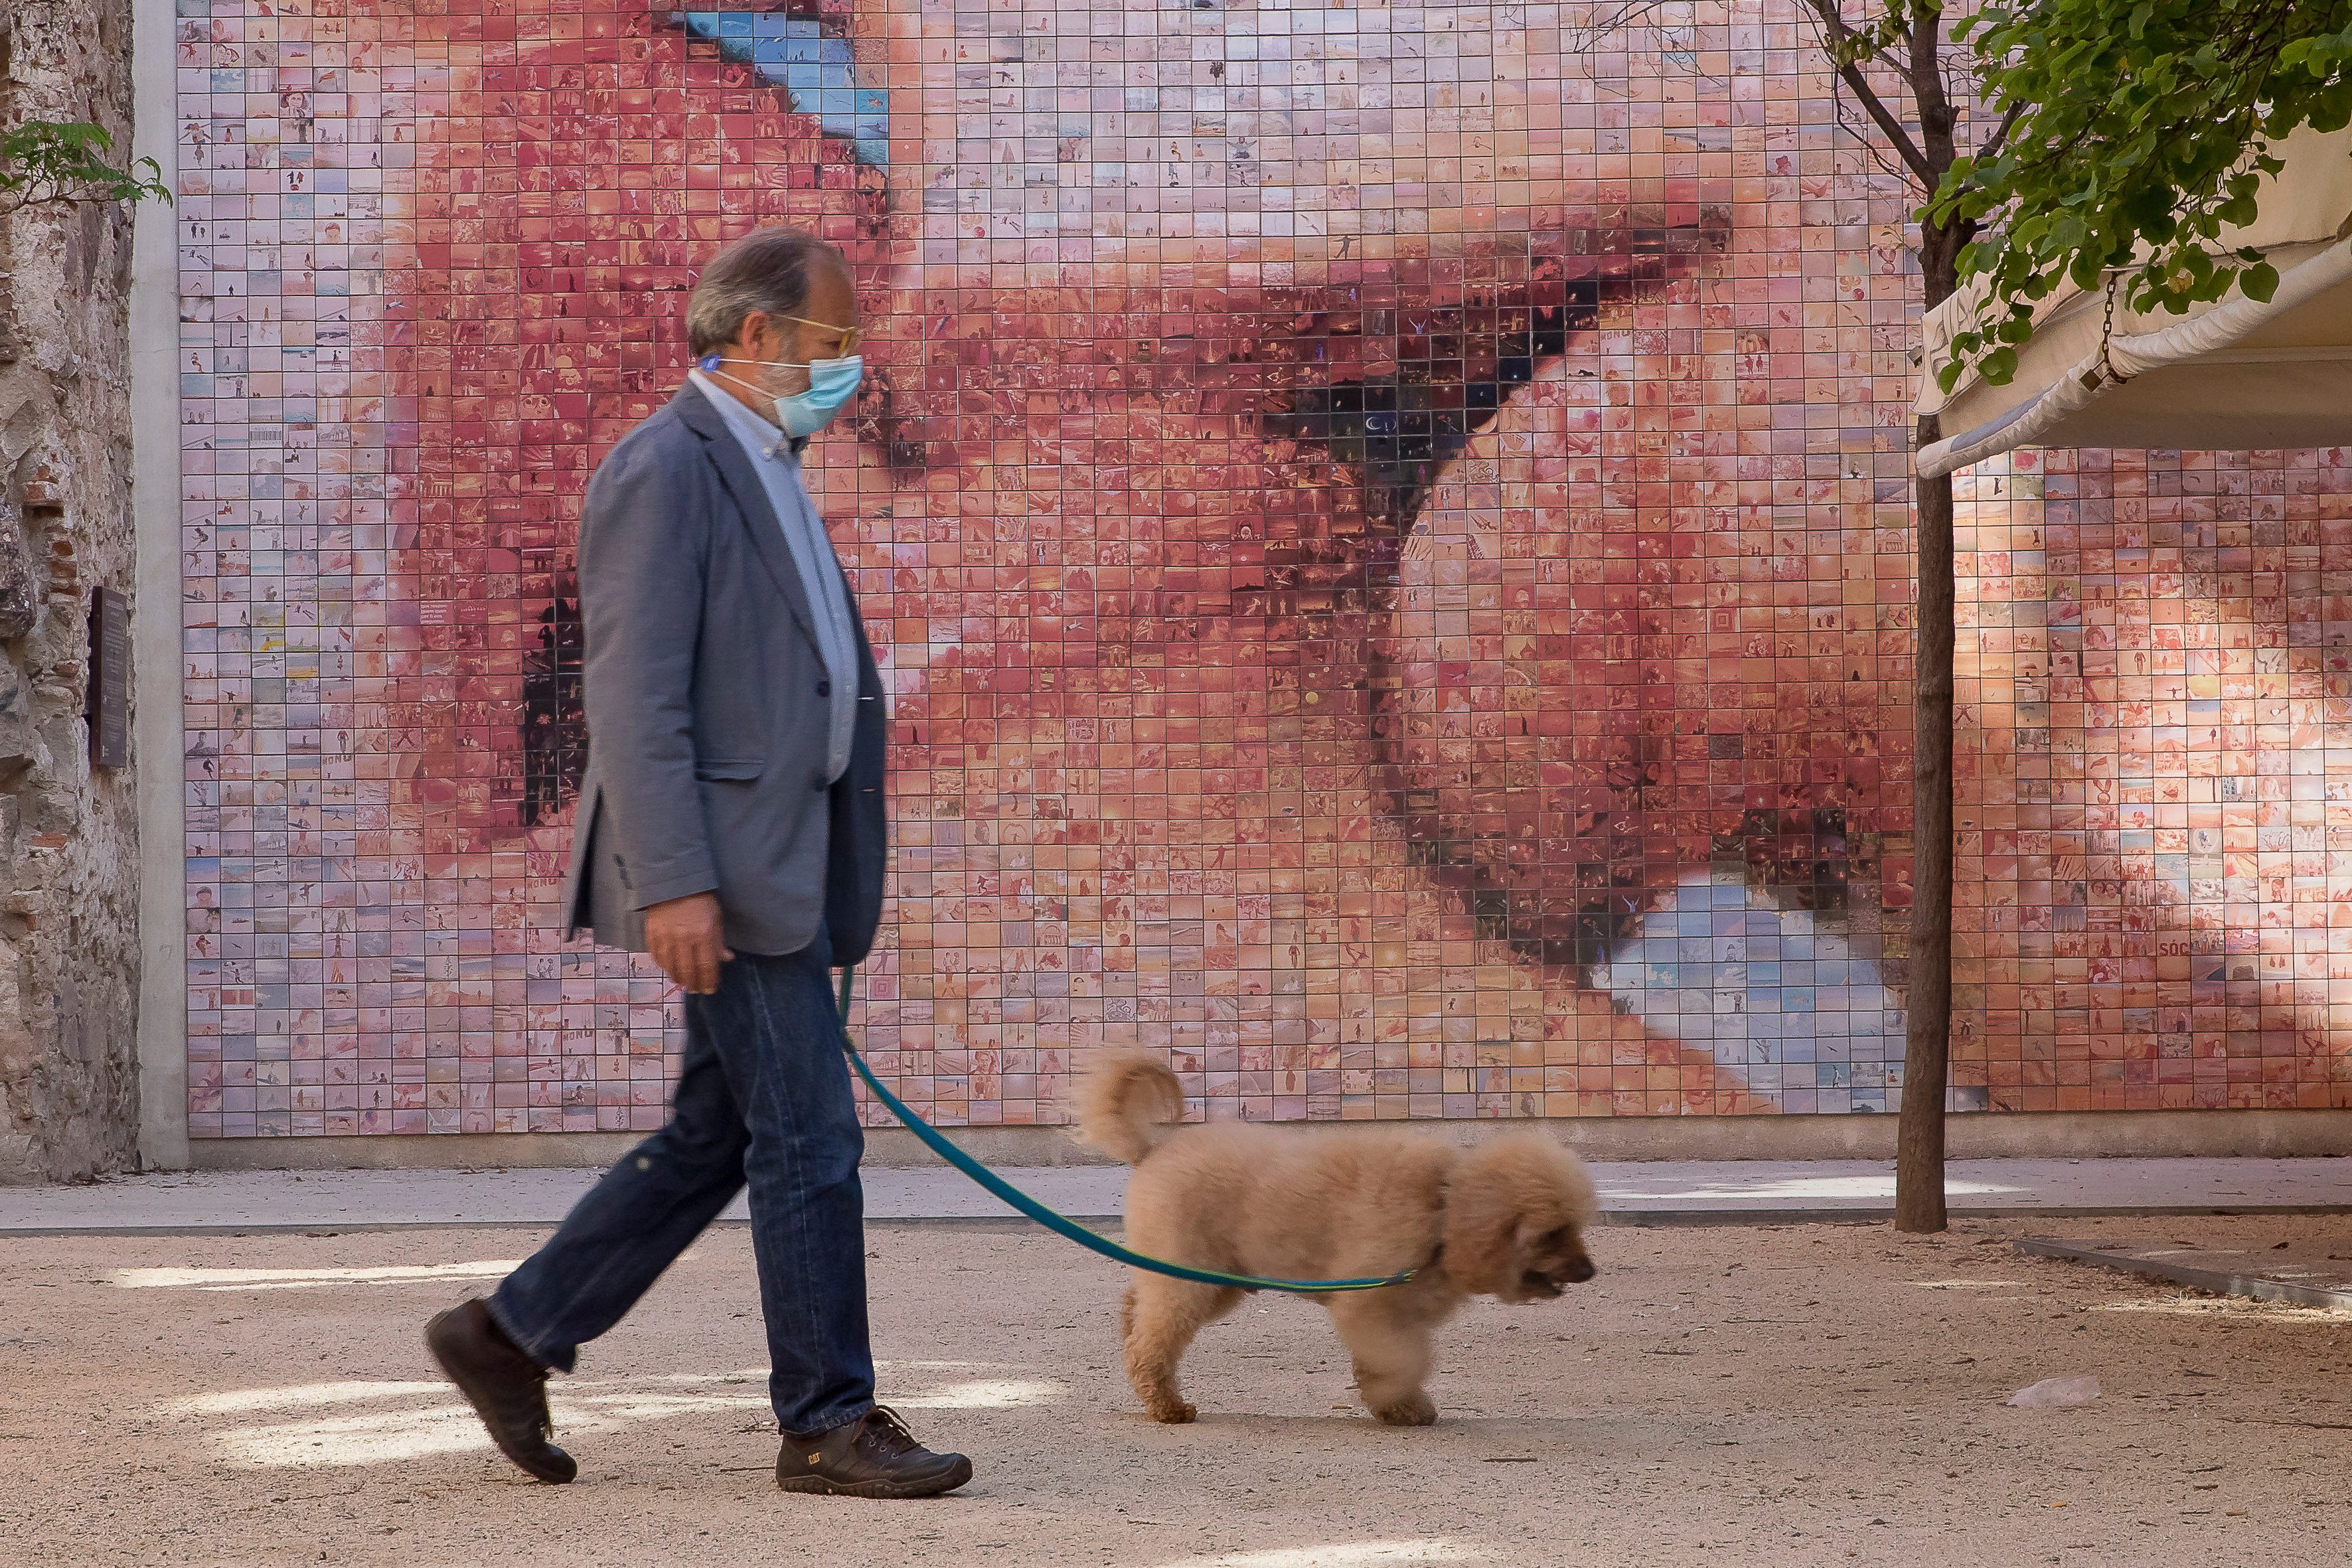 Daily Life In Barcelona Amid Coronavirus Emergency